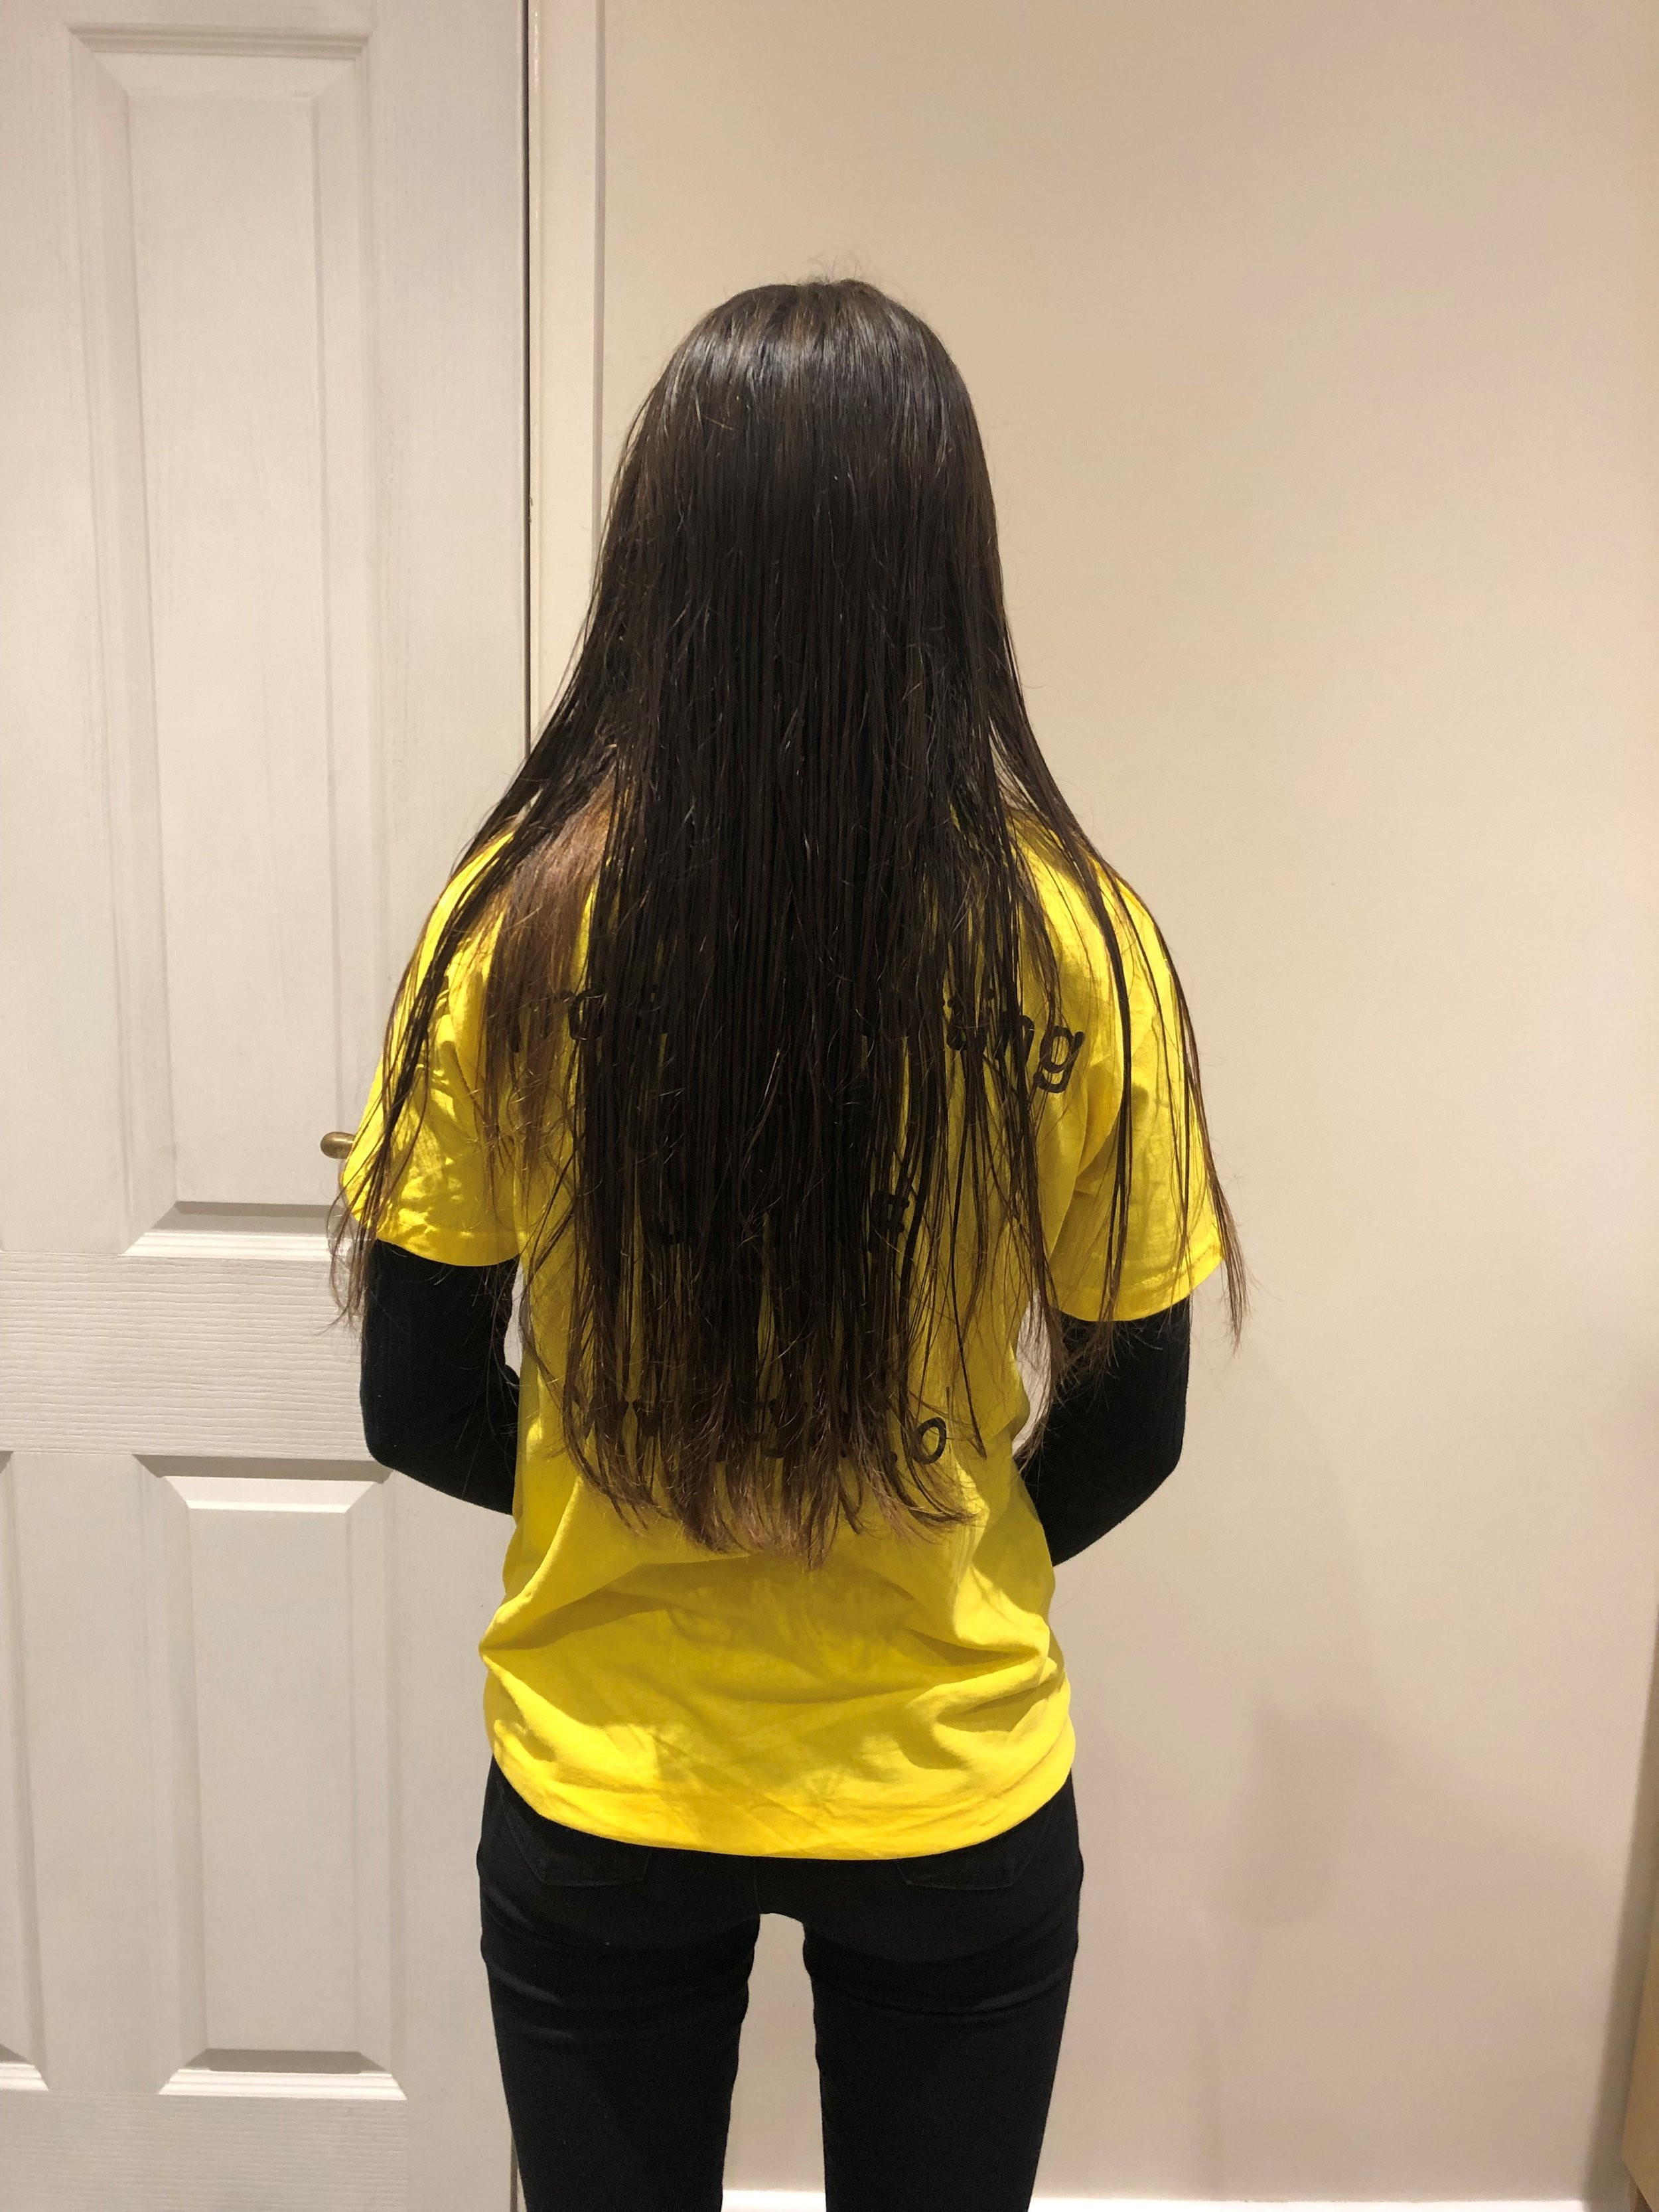 claires hair 2.jpg